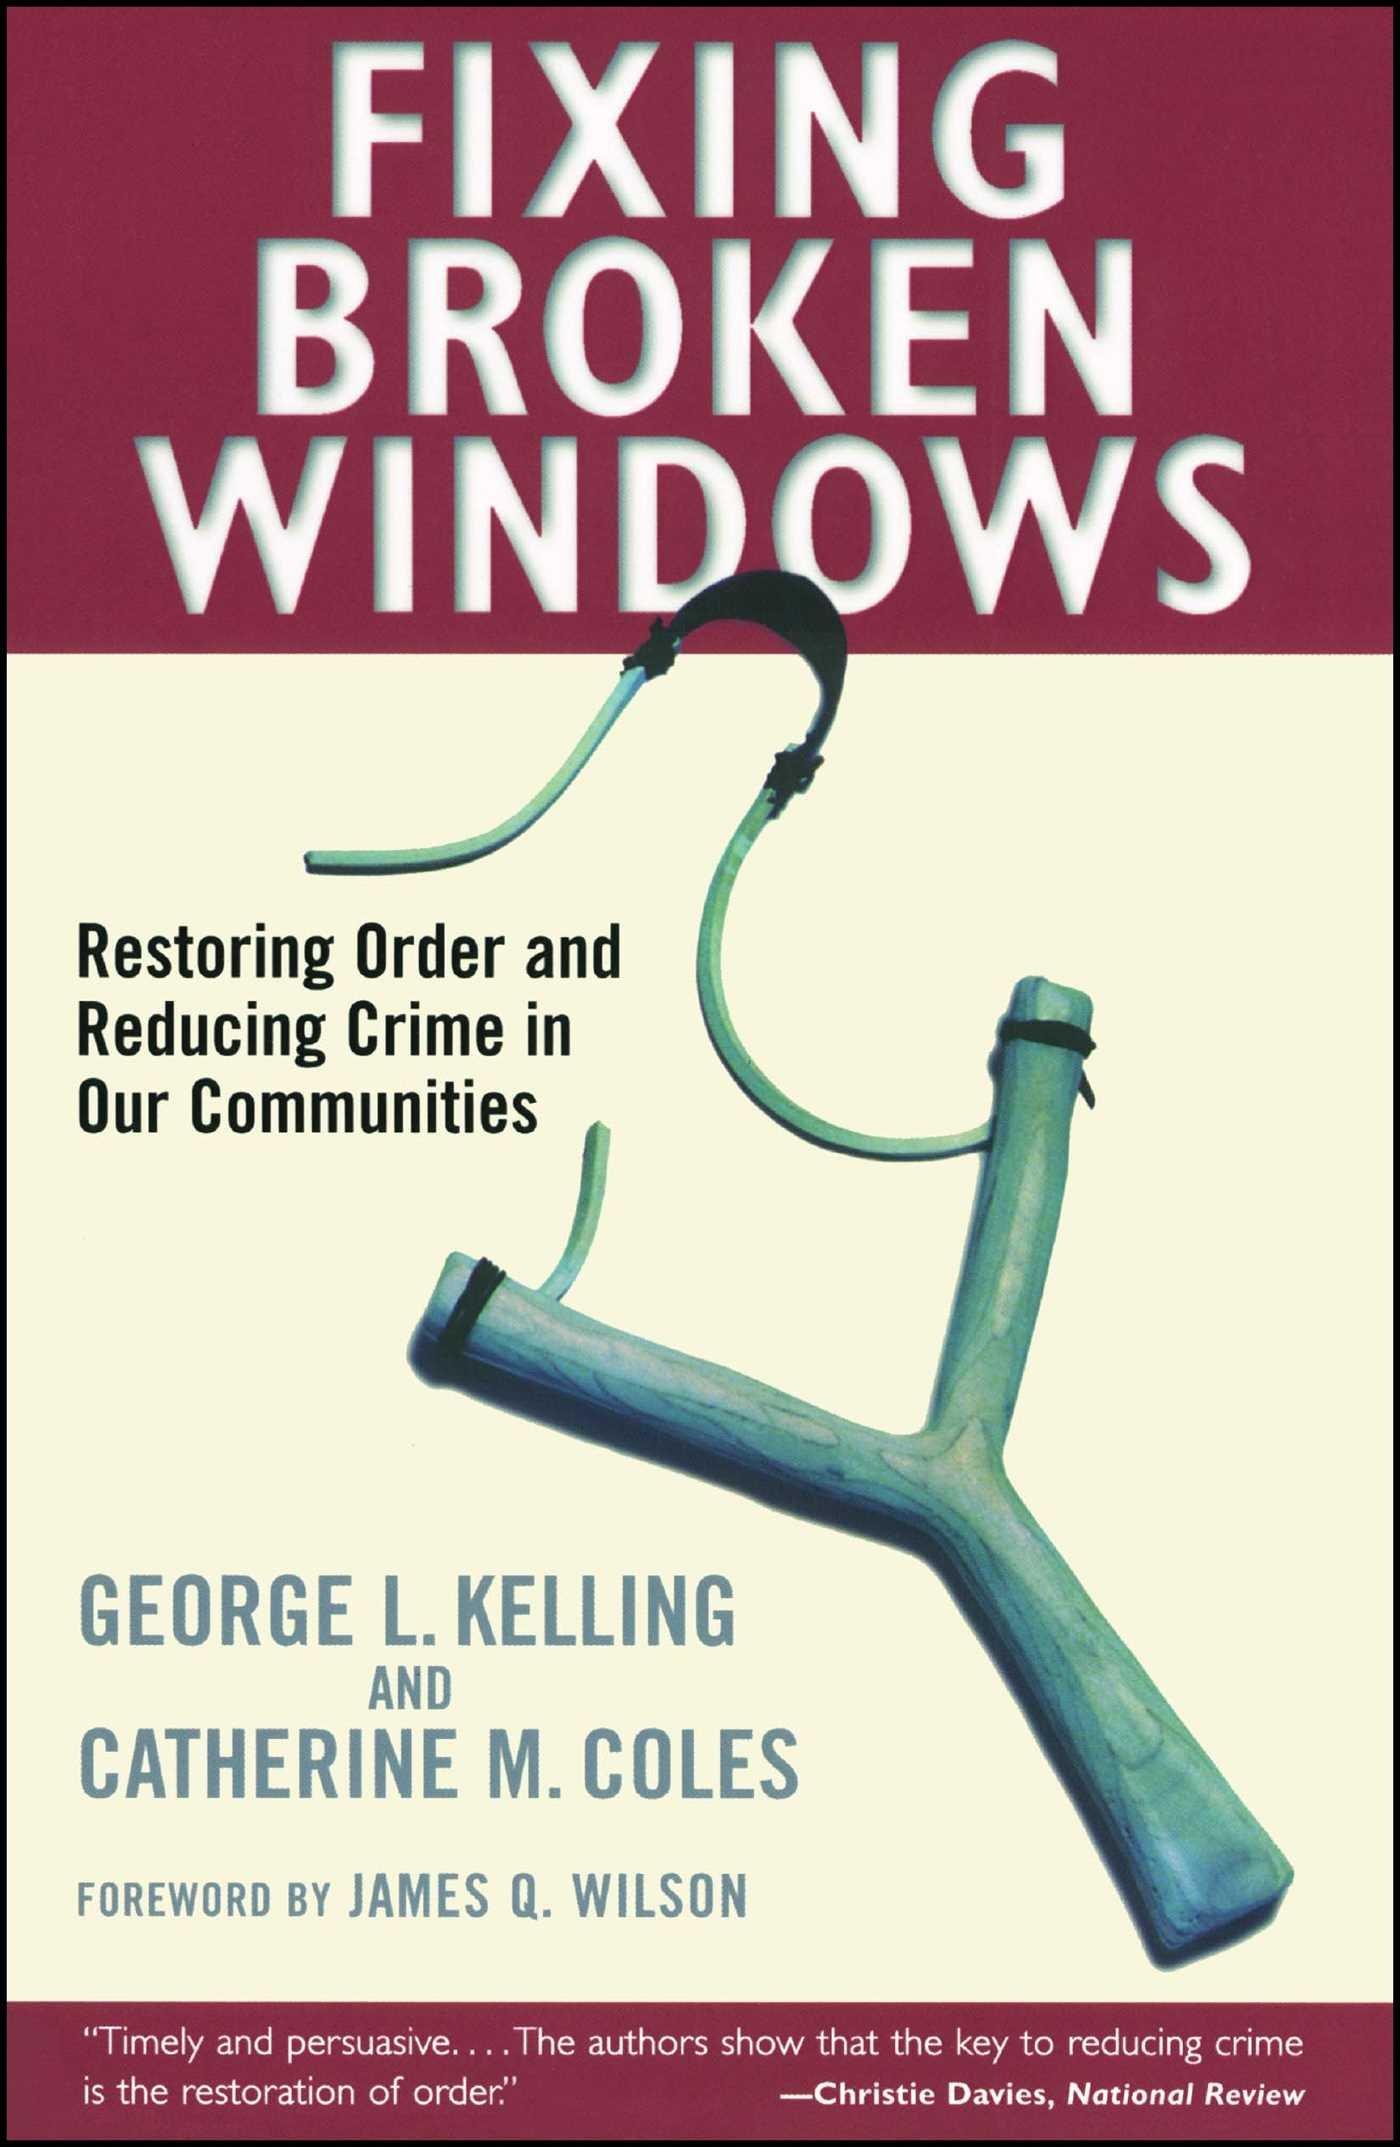 Theory of broken windows: practical sense 54